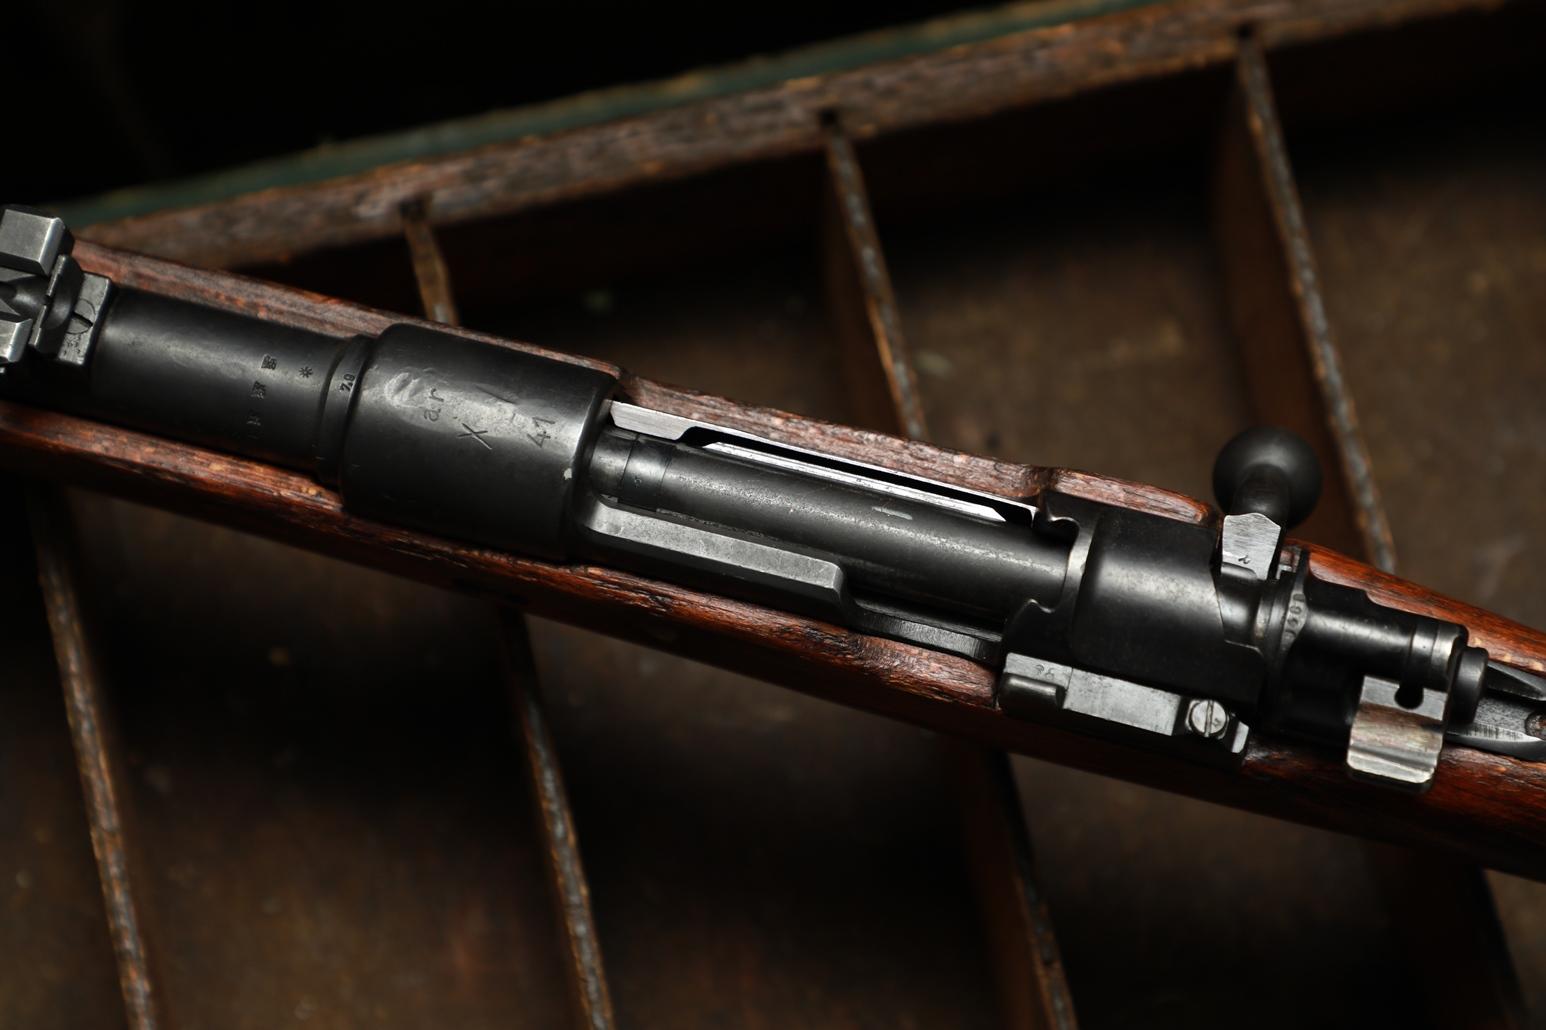 Карабин Mauser K98, #4183, 1941 год, завод AR, №5402